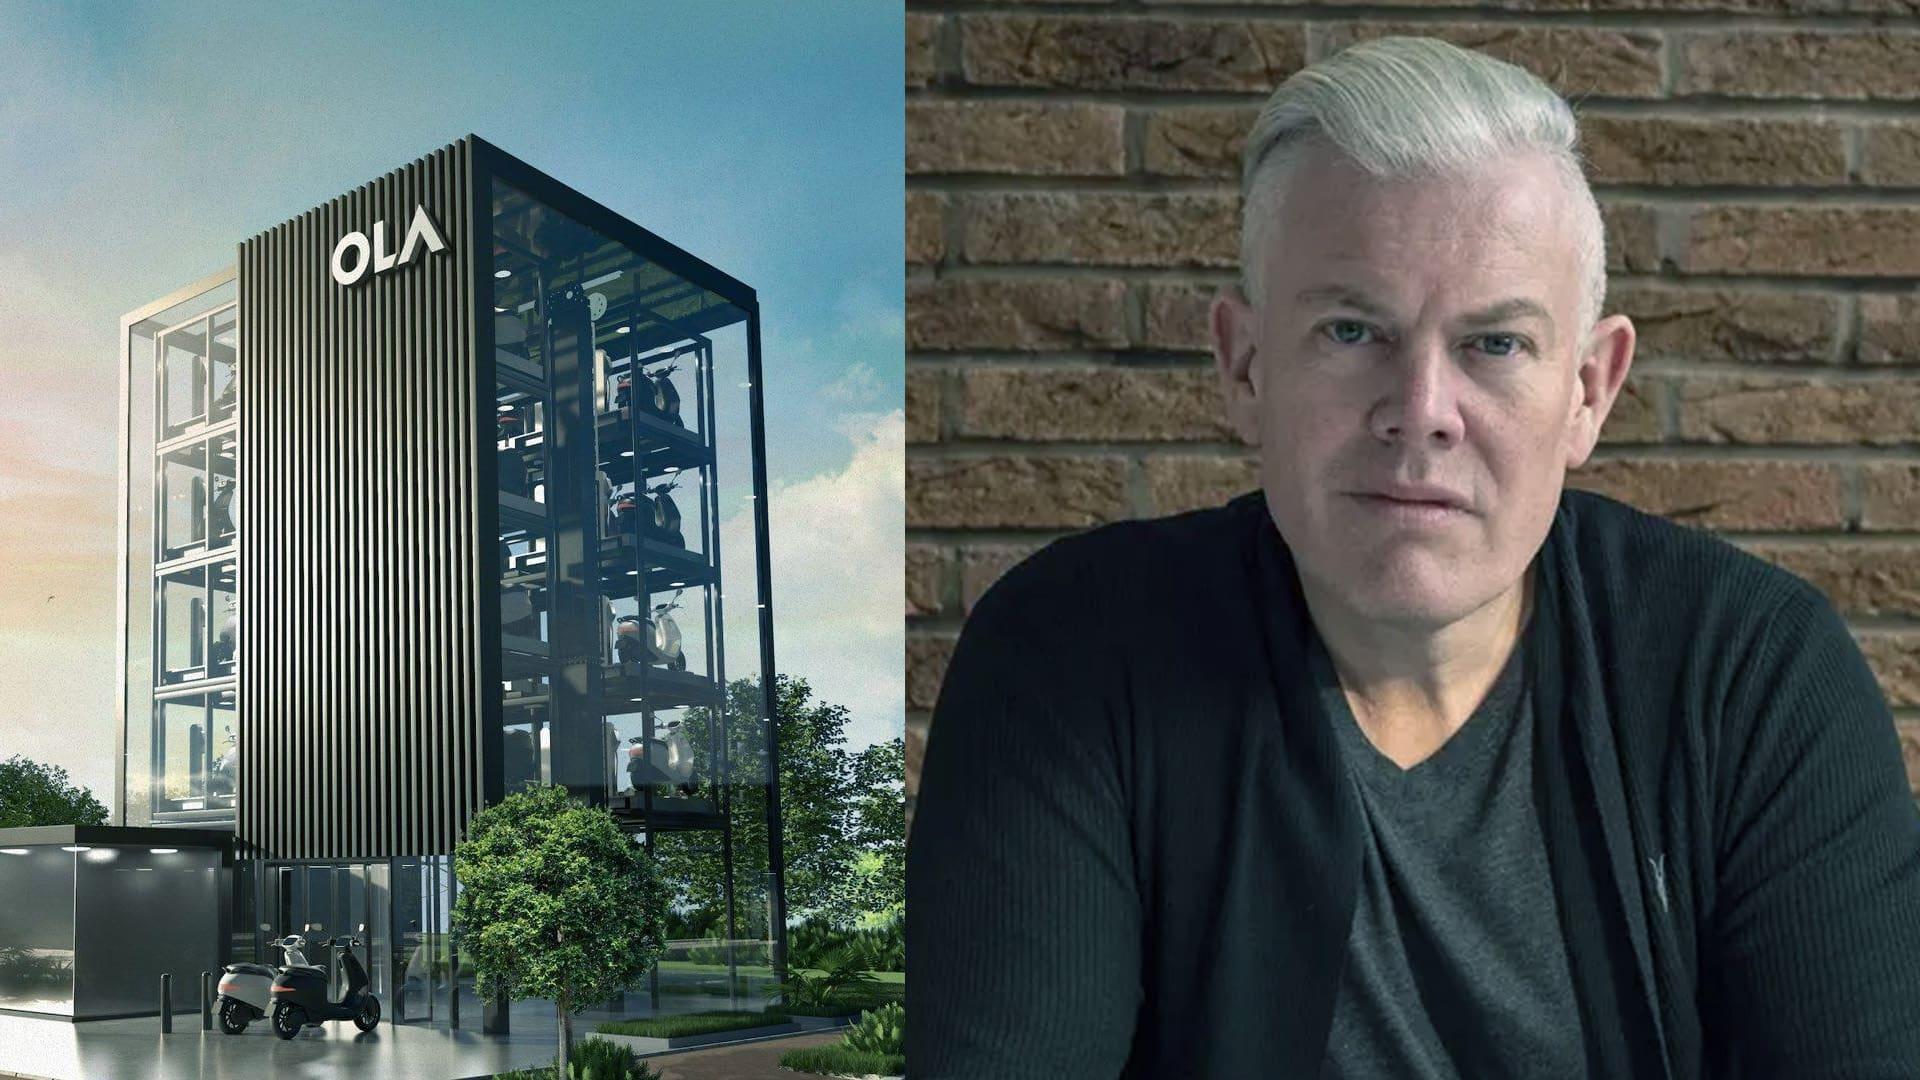 Ola Electric ropes in ex-Jaguar designer Wayne Burgess as head of vehicle design